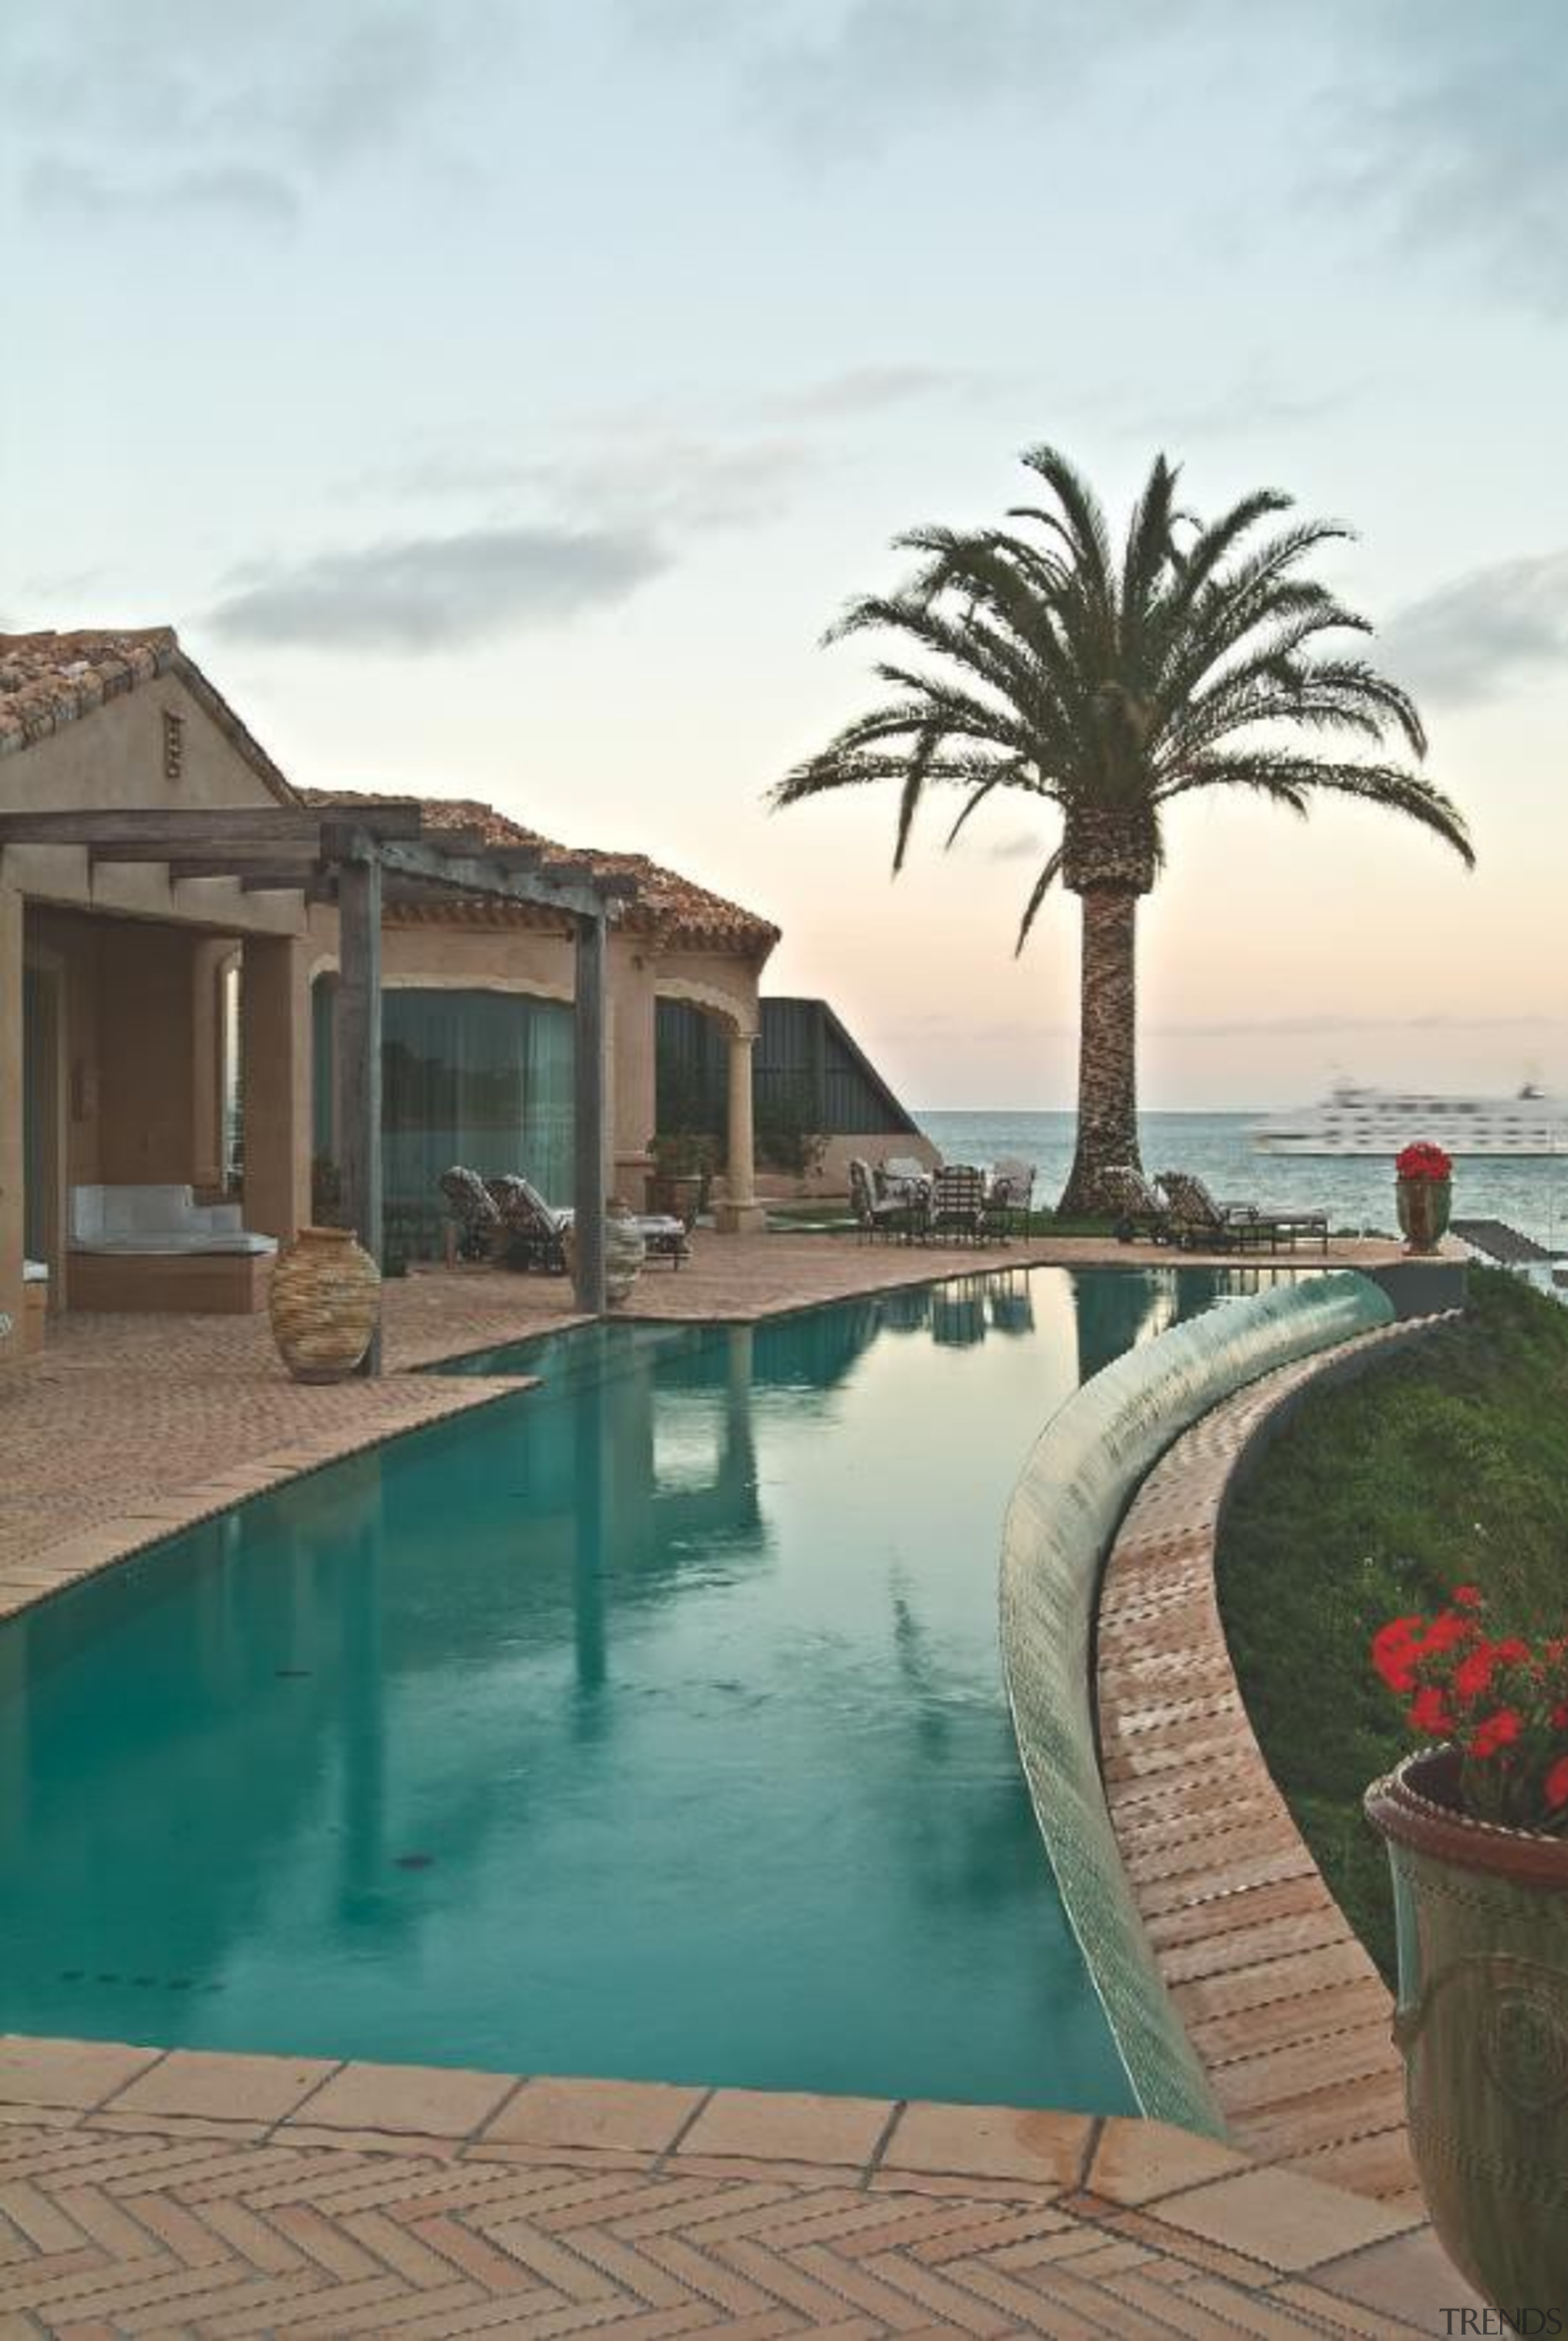 Bisazza green swimming pool tiles - Bisazza Range arecales, estate, hacienda, home, mansion, palm tree, property, real estate, resort, sky, swimming pool, vacation, villa, white